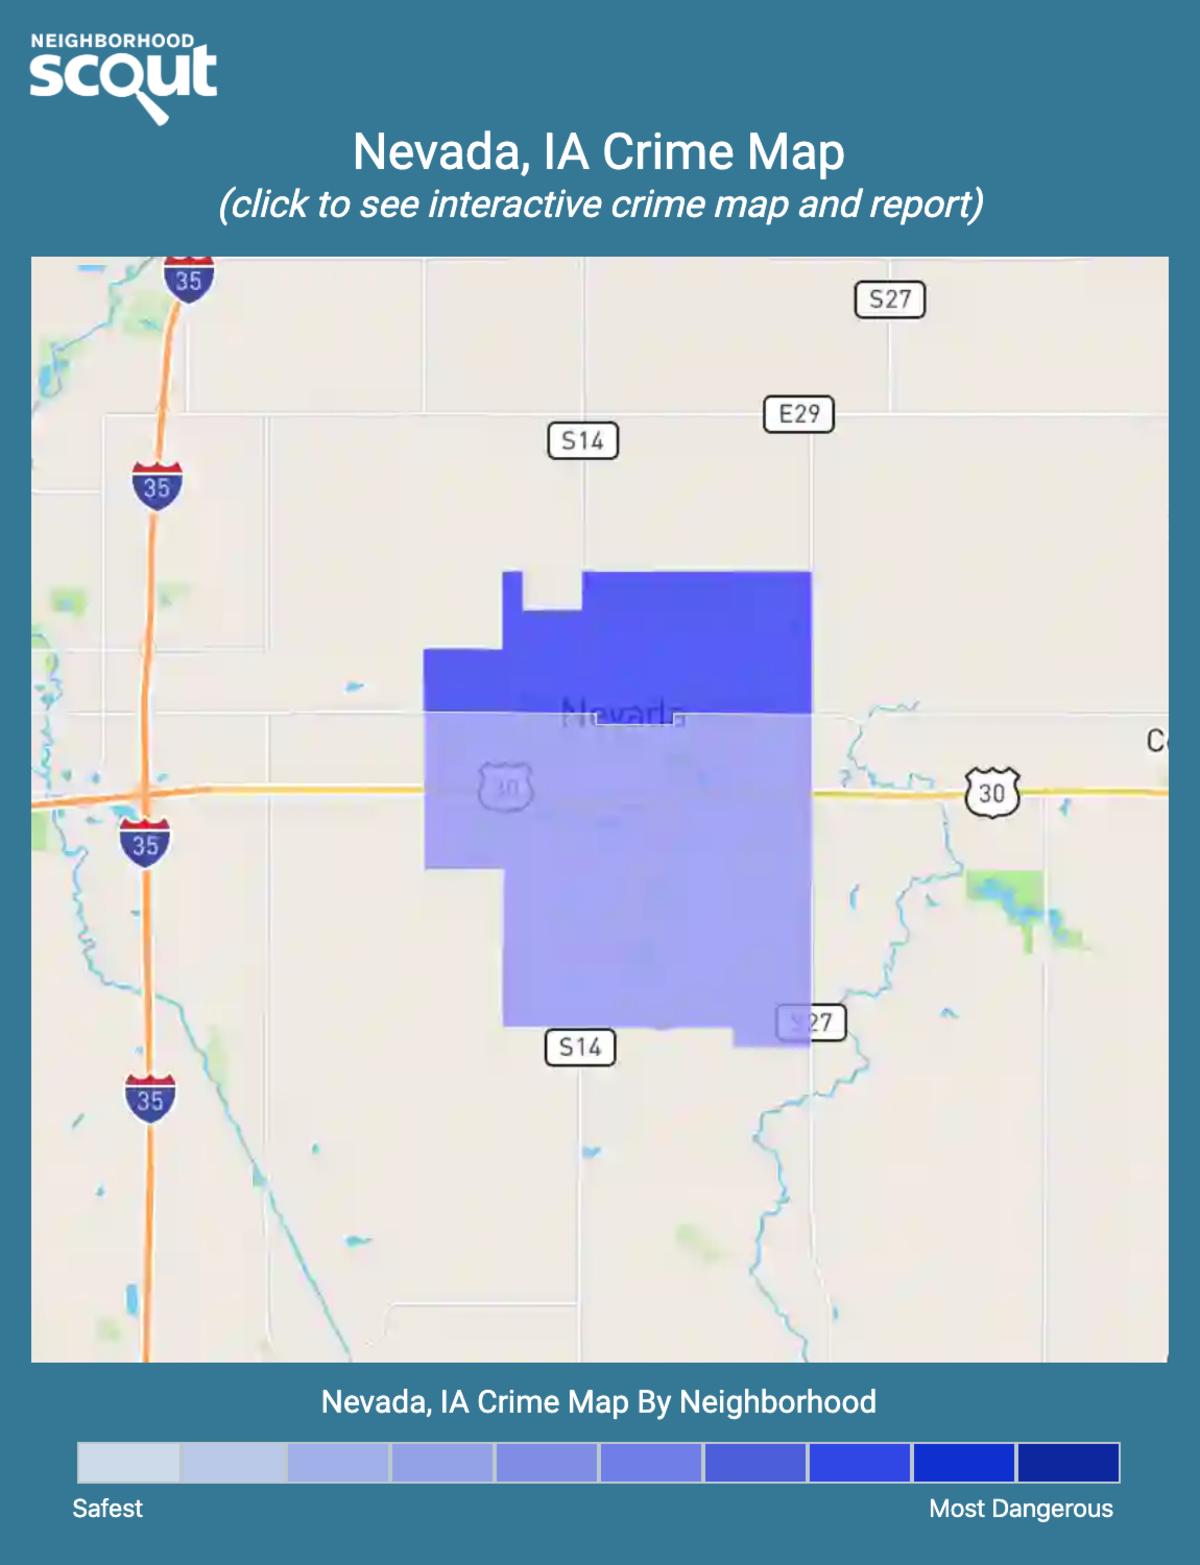 Nevada, Iowa crime map